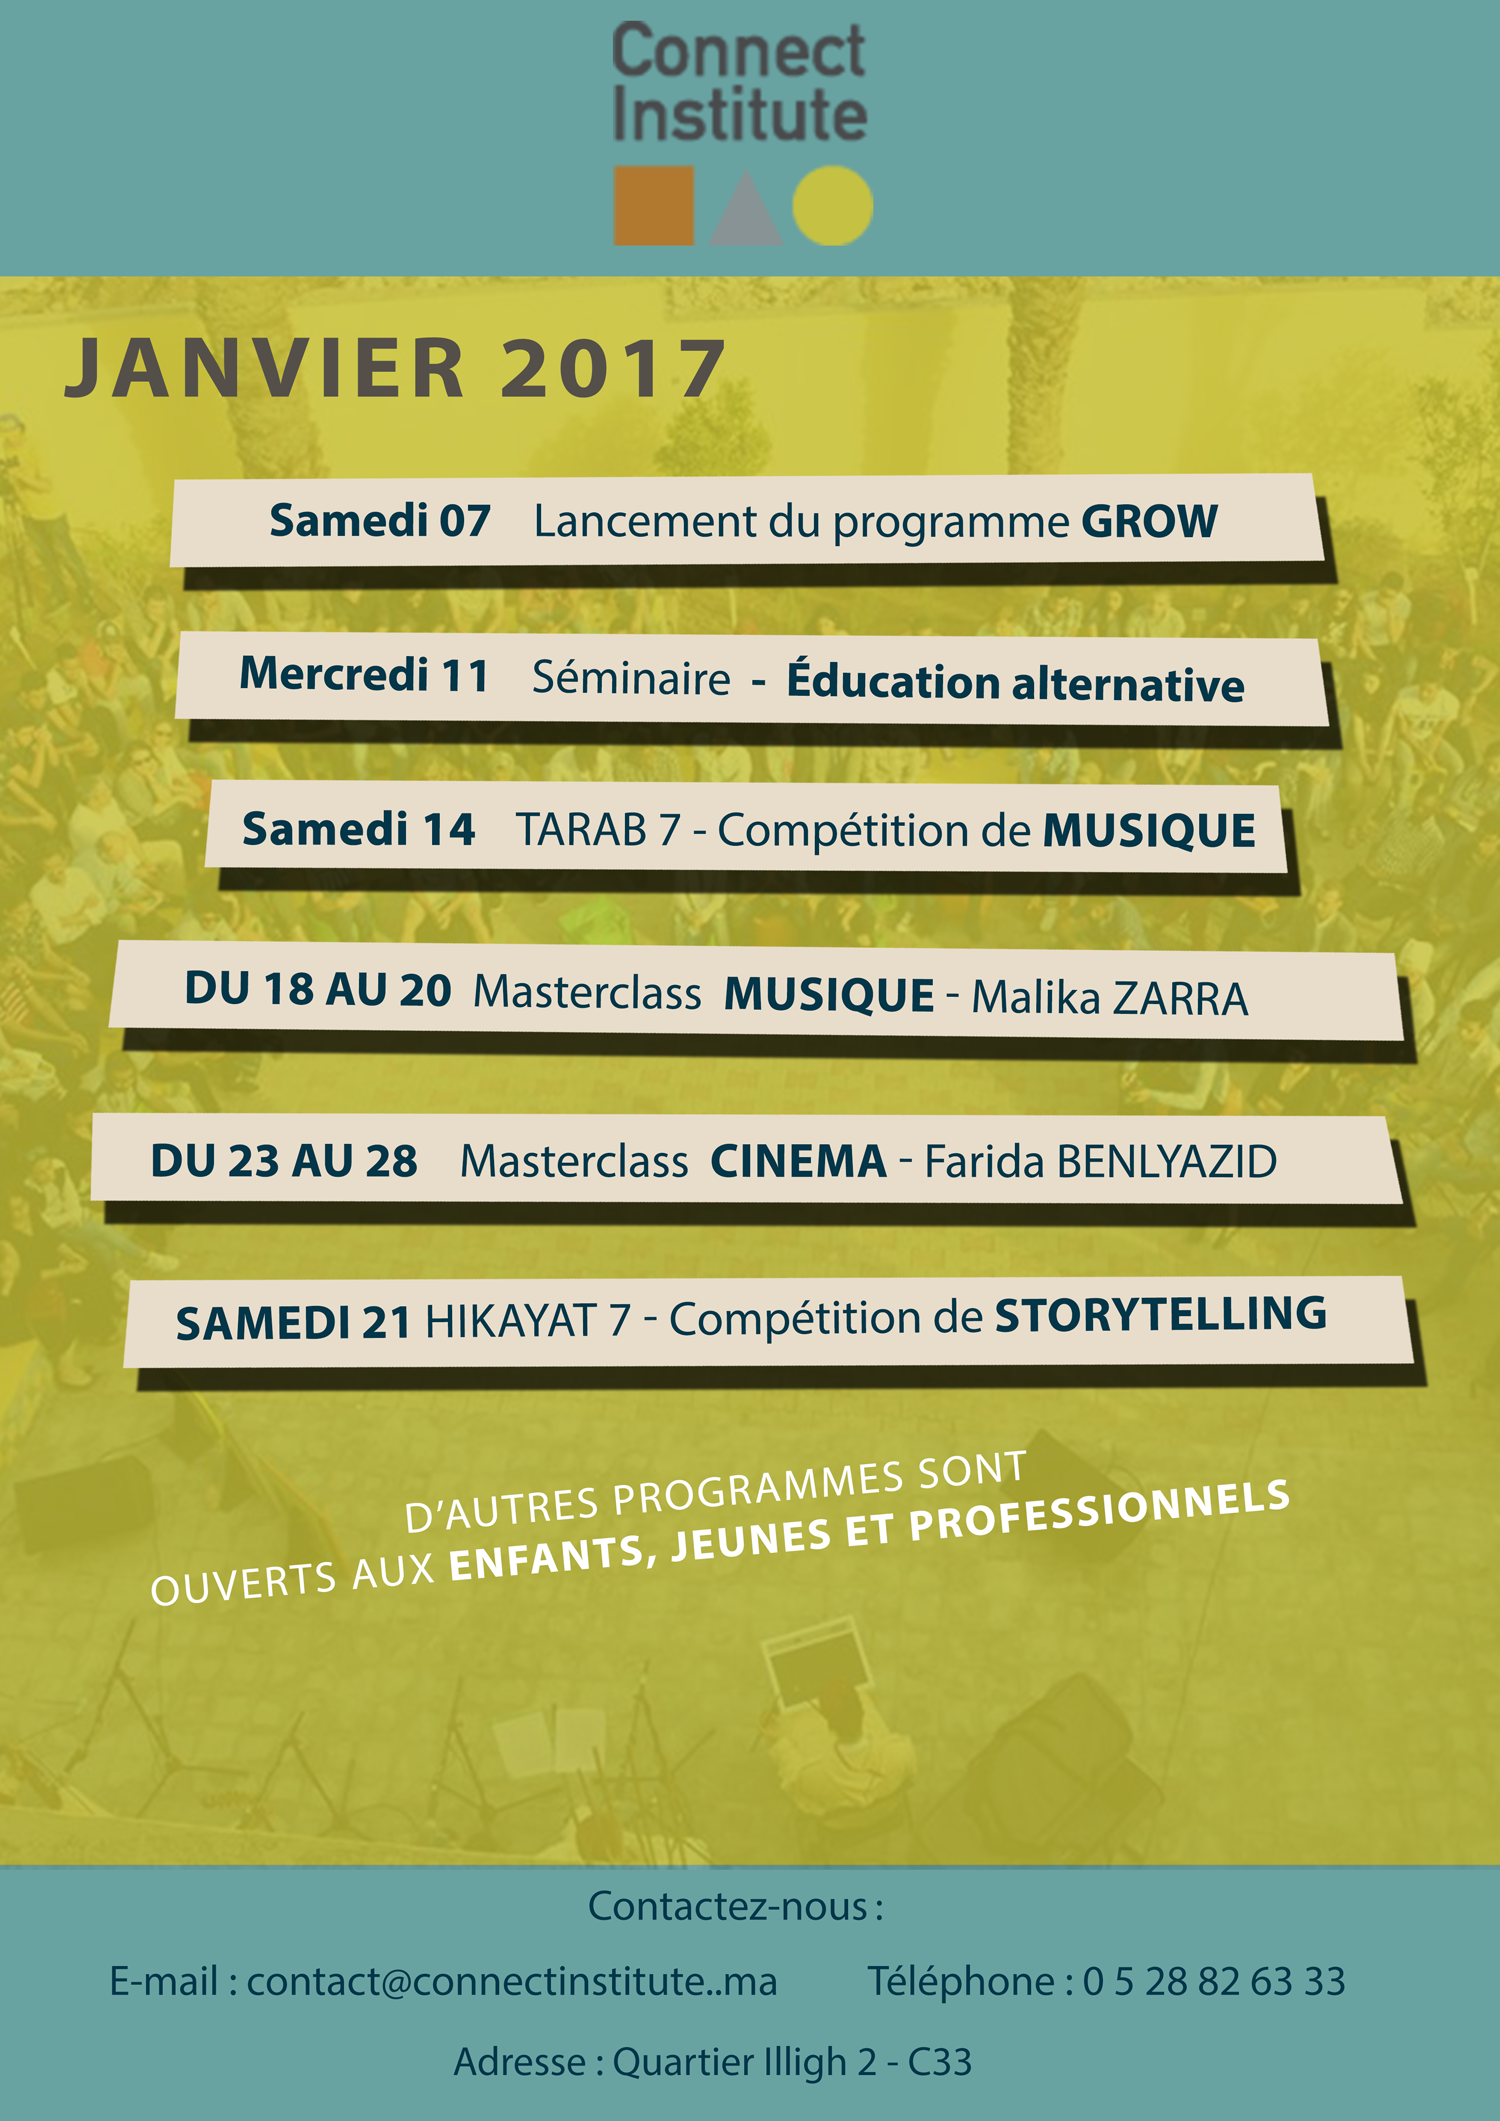 janvier-2017